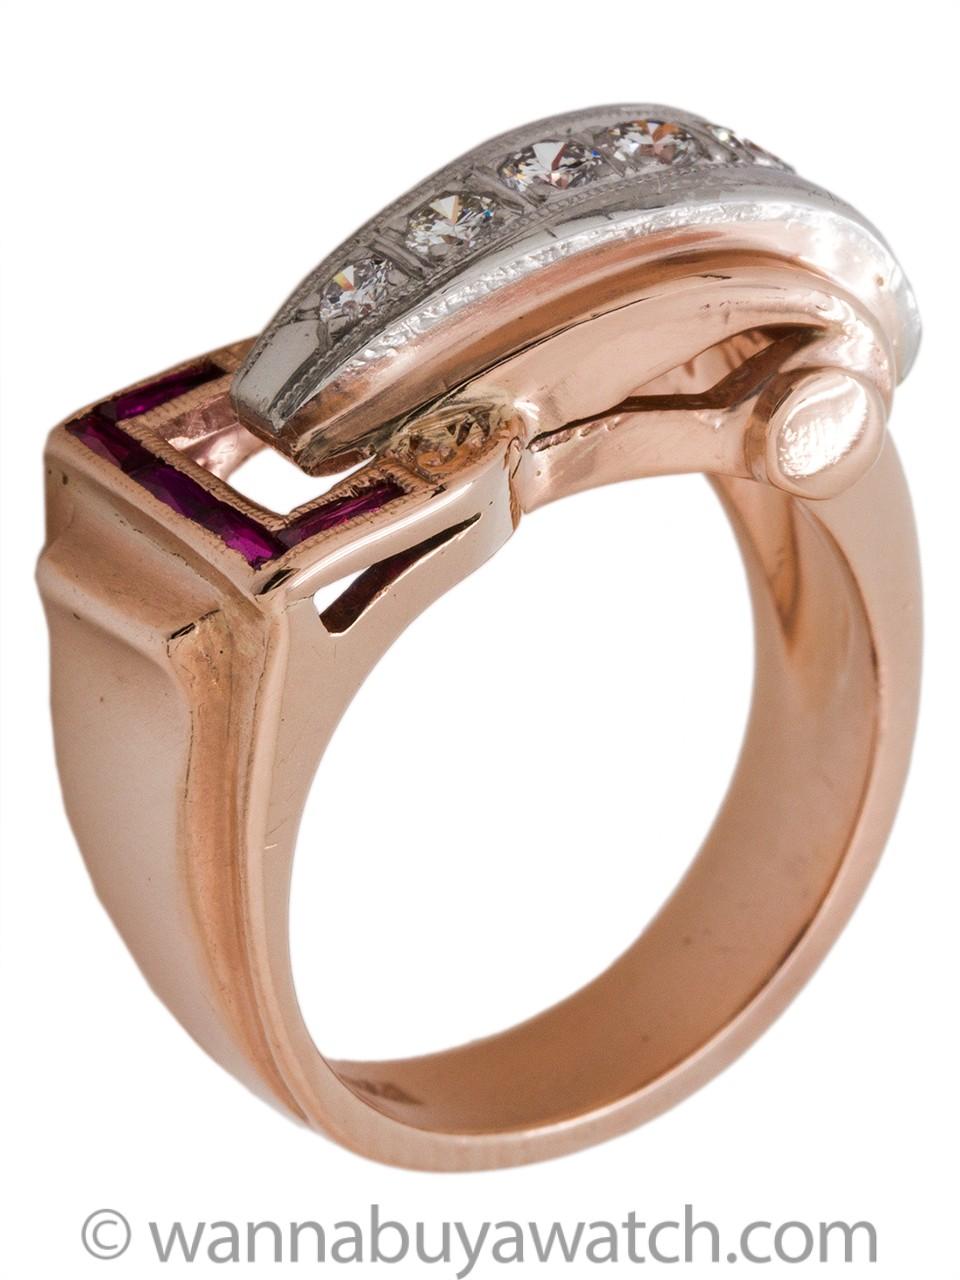 Vintage Retro 14K PG & WG Diamond Ruby Ring 0.25ct circa 1940s